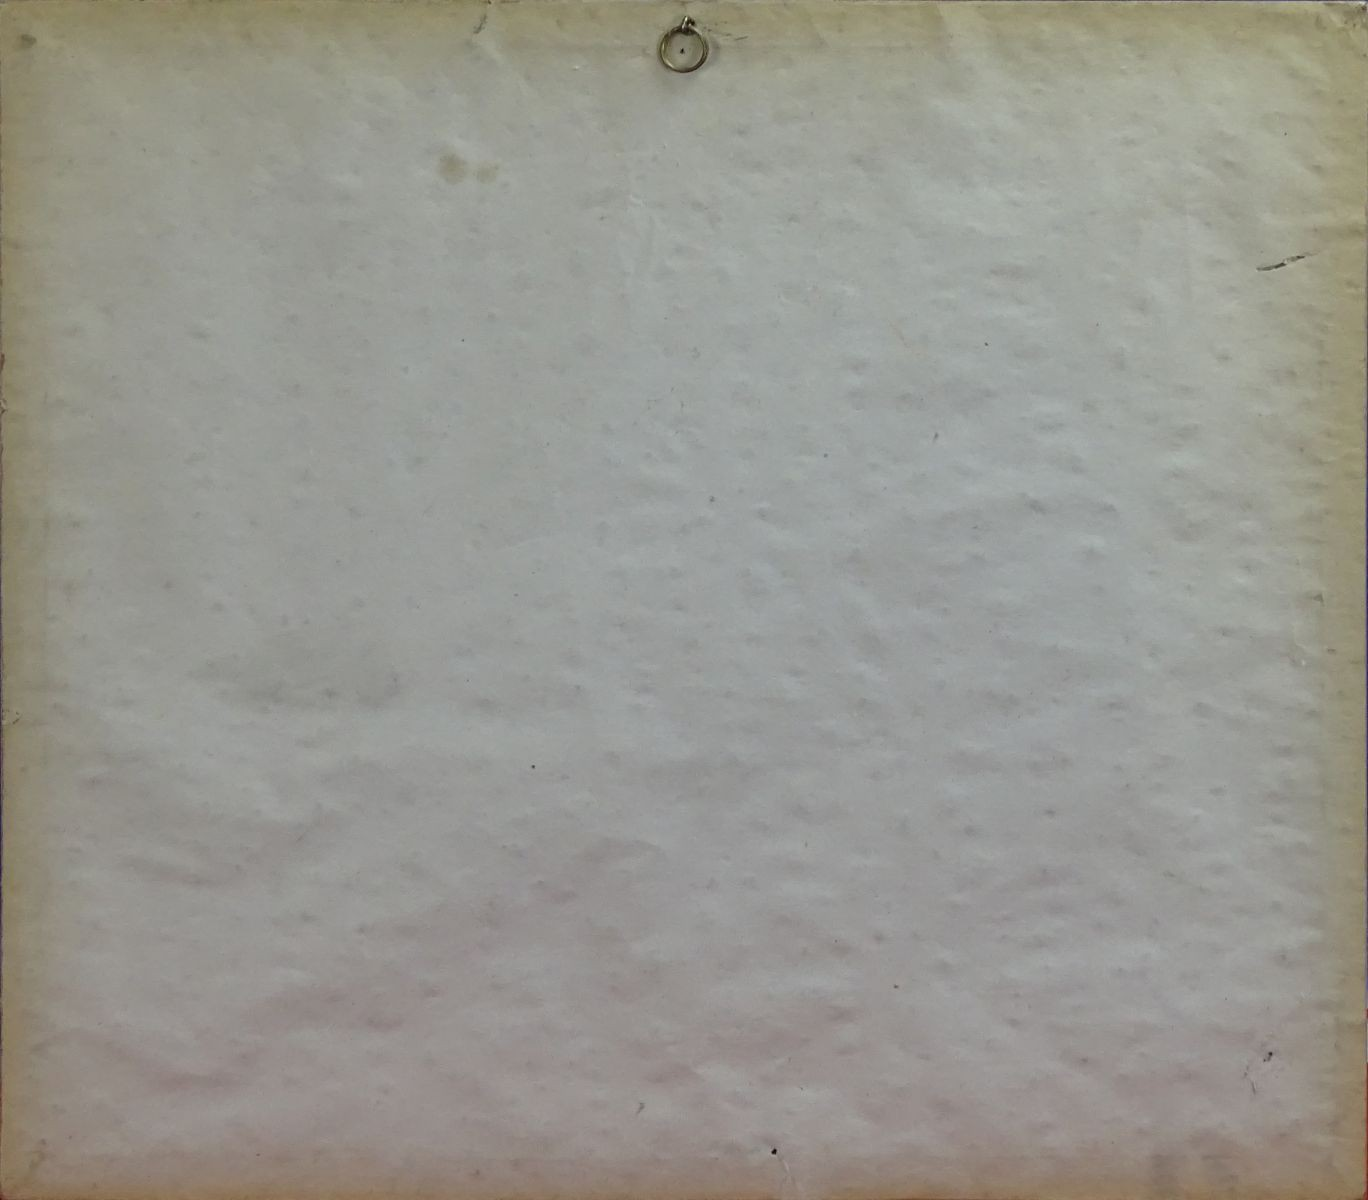 DSC07871.JPG (1368�1200)